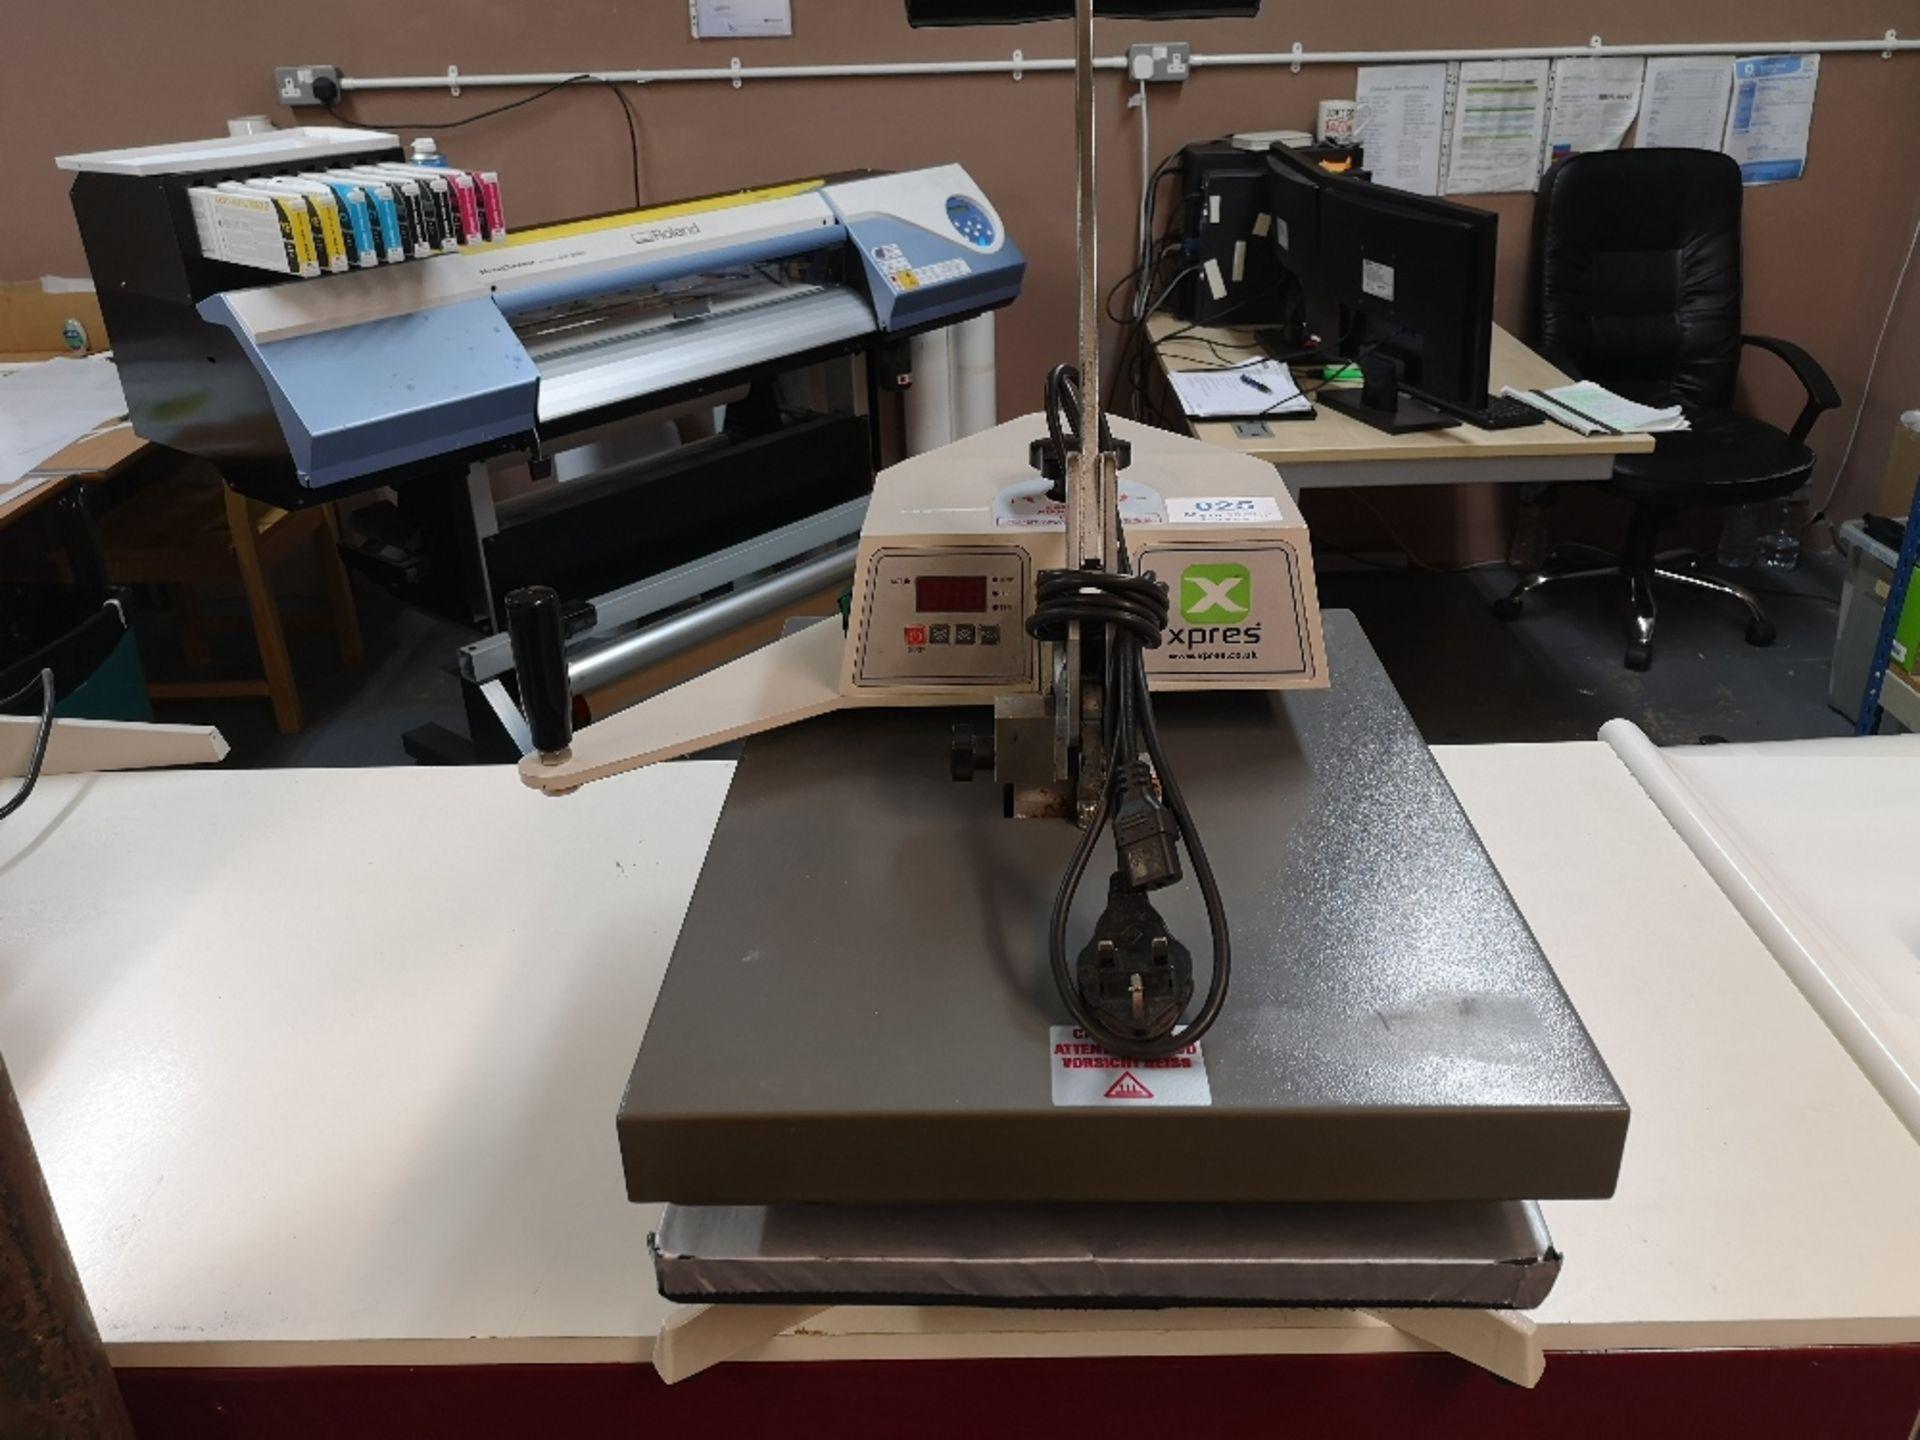 XPRES BMC20 Swing Press T-Shirt Printing Machine (2017) - Image 2 of 4